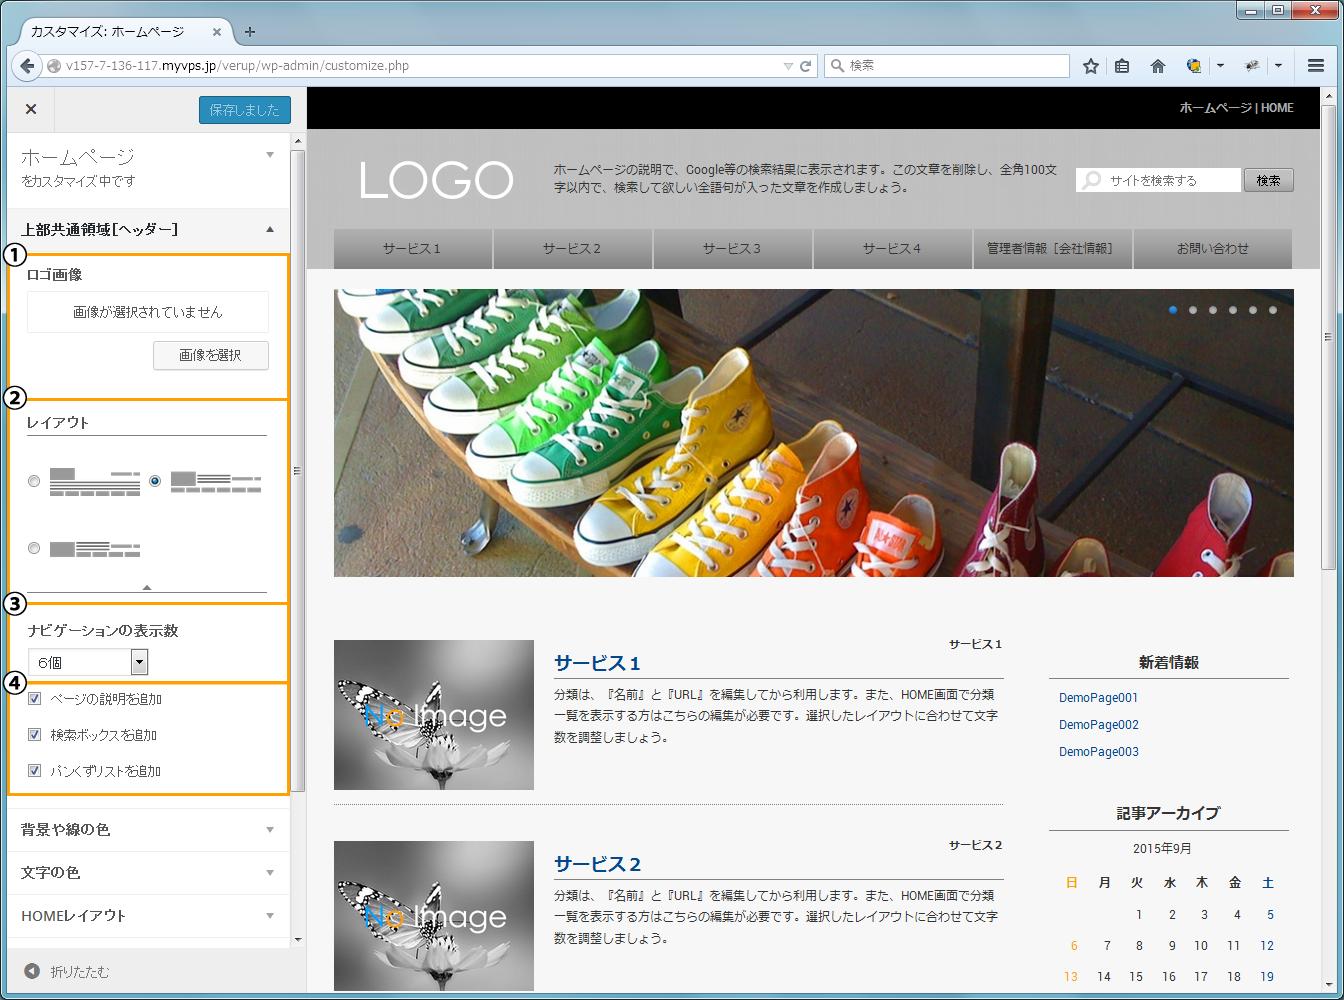 Webサイトデザイン 上部共通領域[ヘッダー] | 簡単格安ホームページ作成サイト - FunMaker[ファンメイカー]